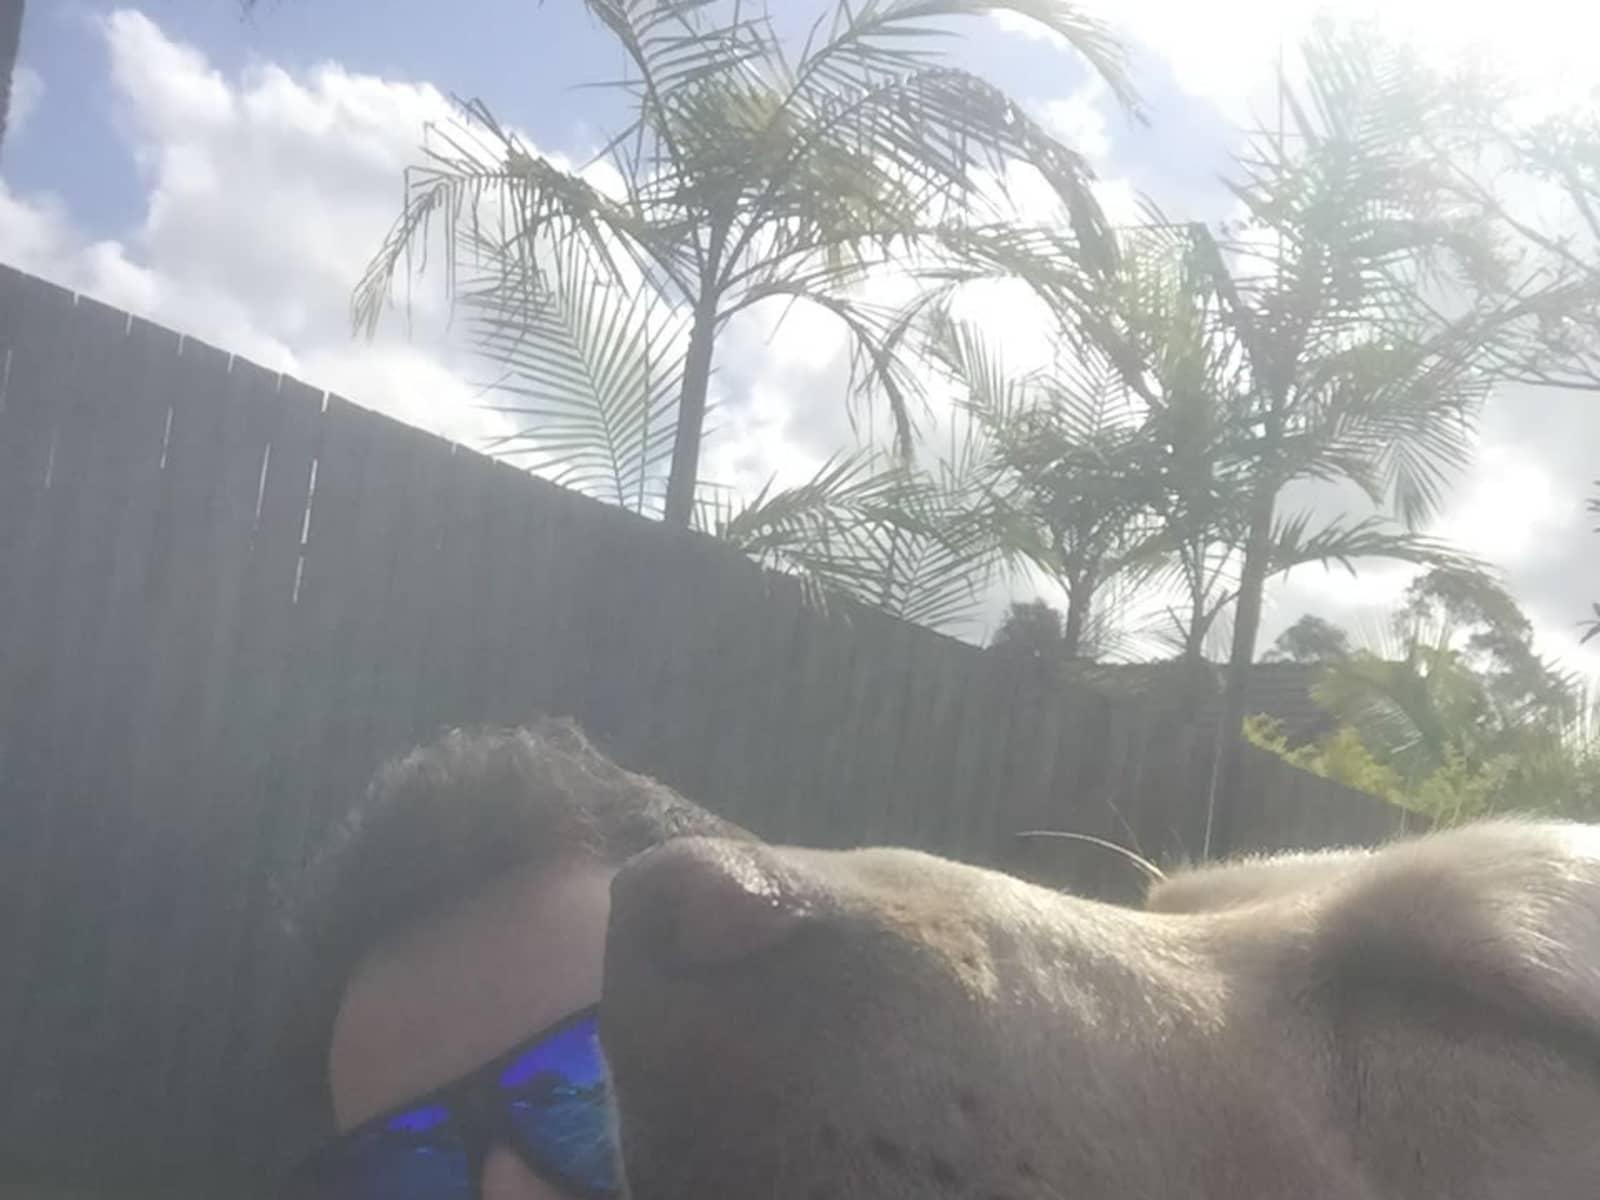 Logan from Sunshine Coast, Queensland, Australia